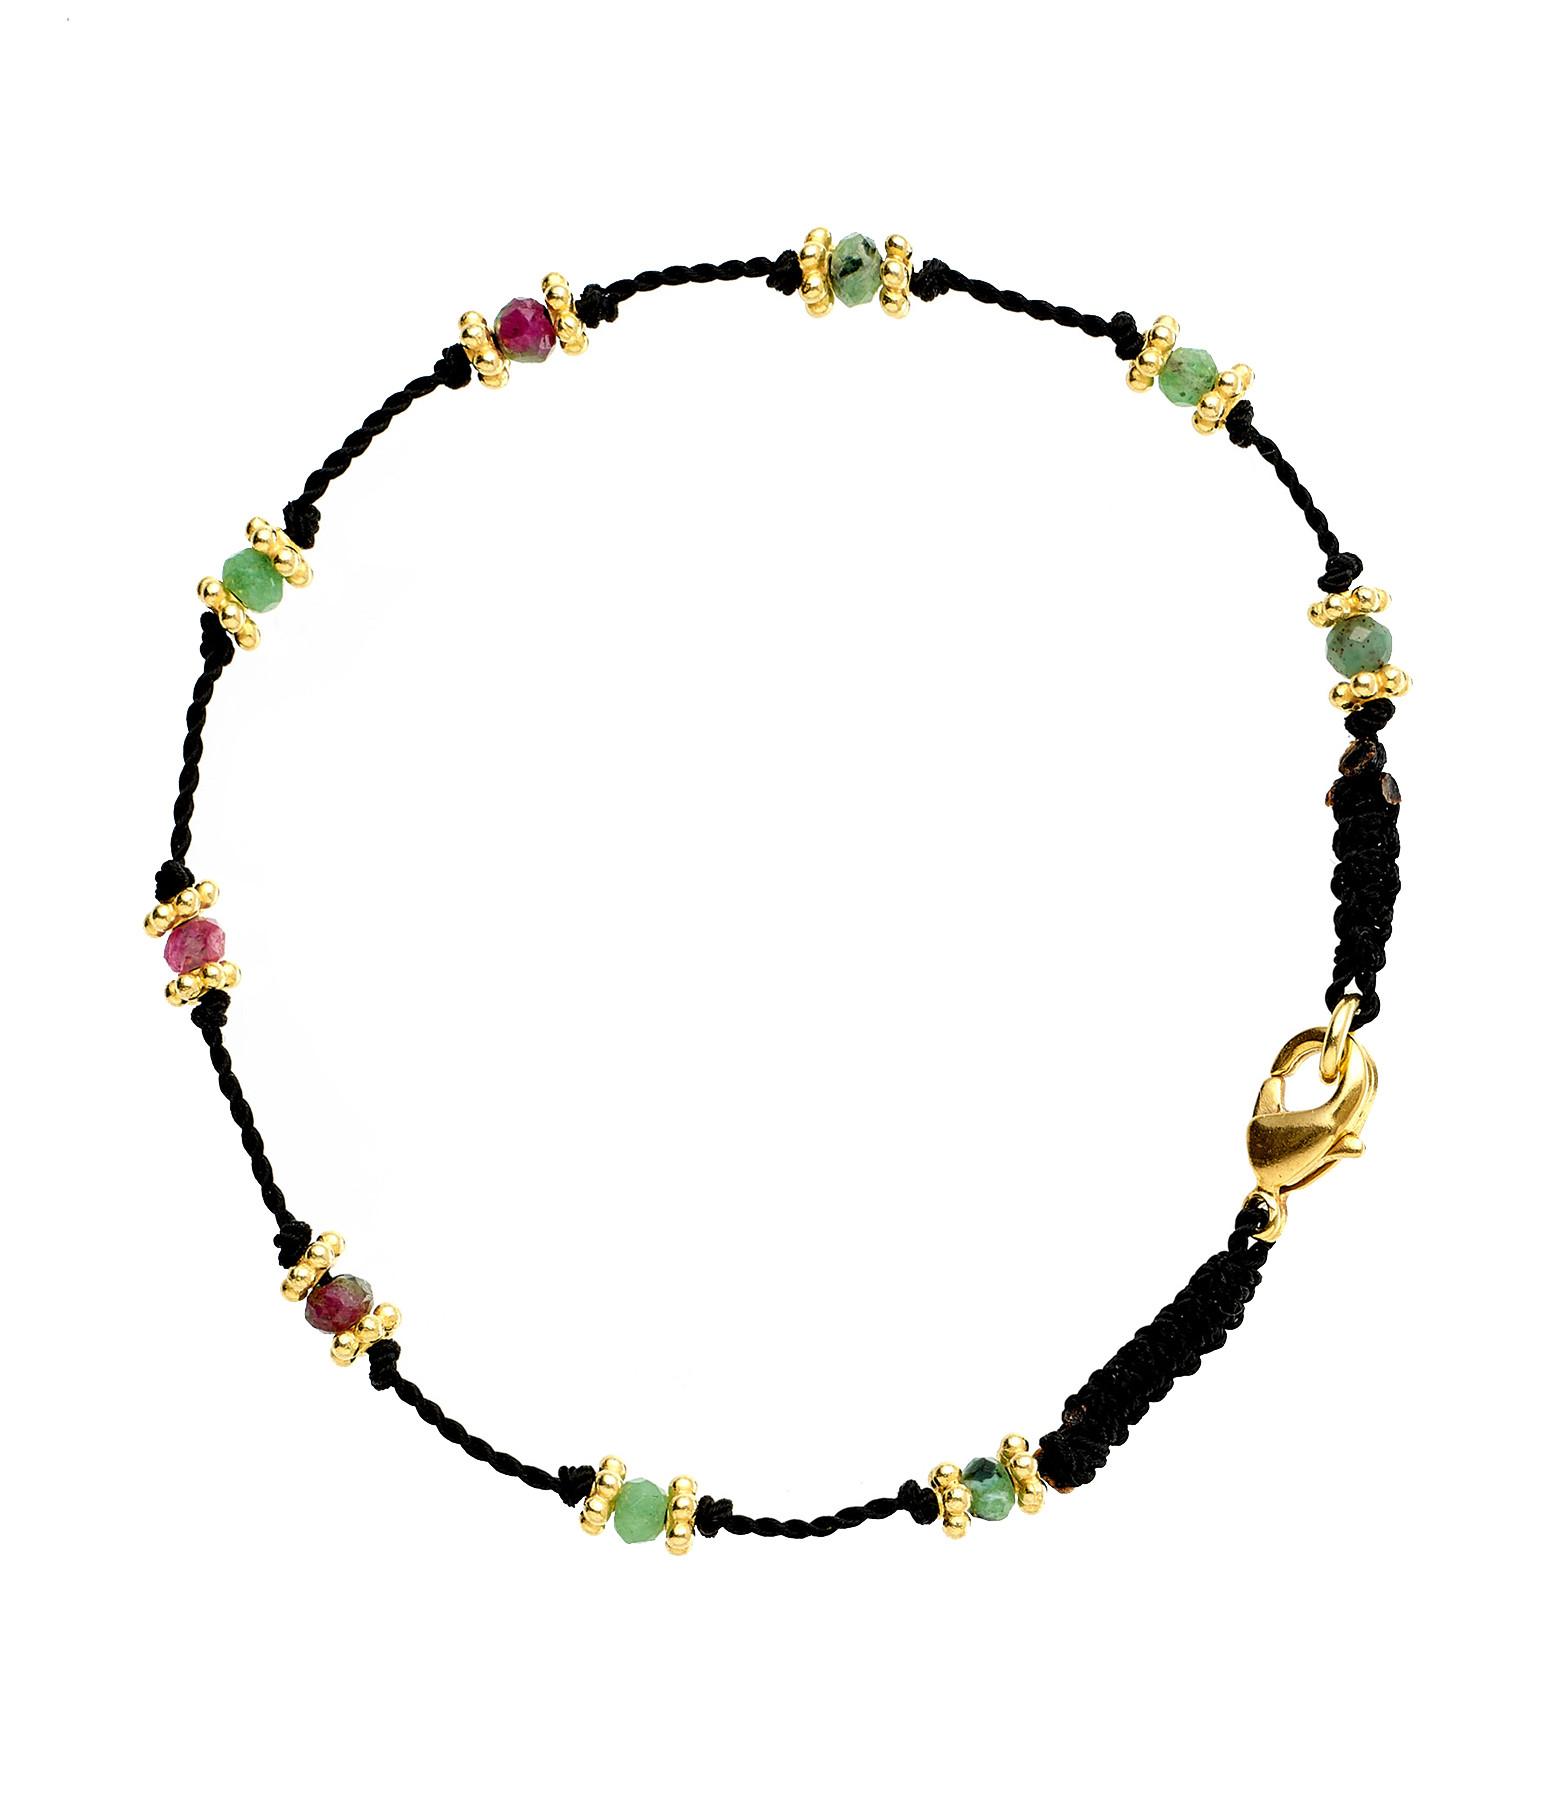 TITYARAVY - Bracelet Lotus Noir Rubisoizite Plaqué Or